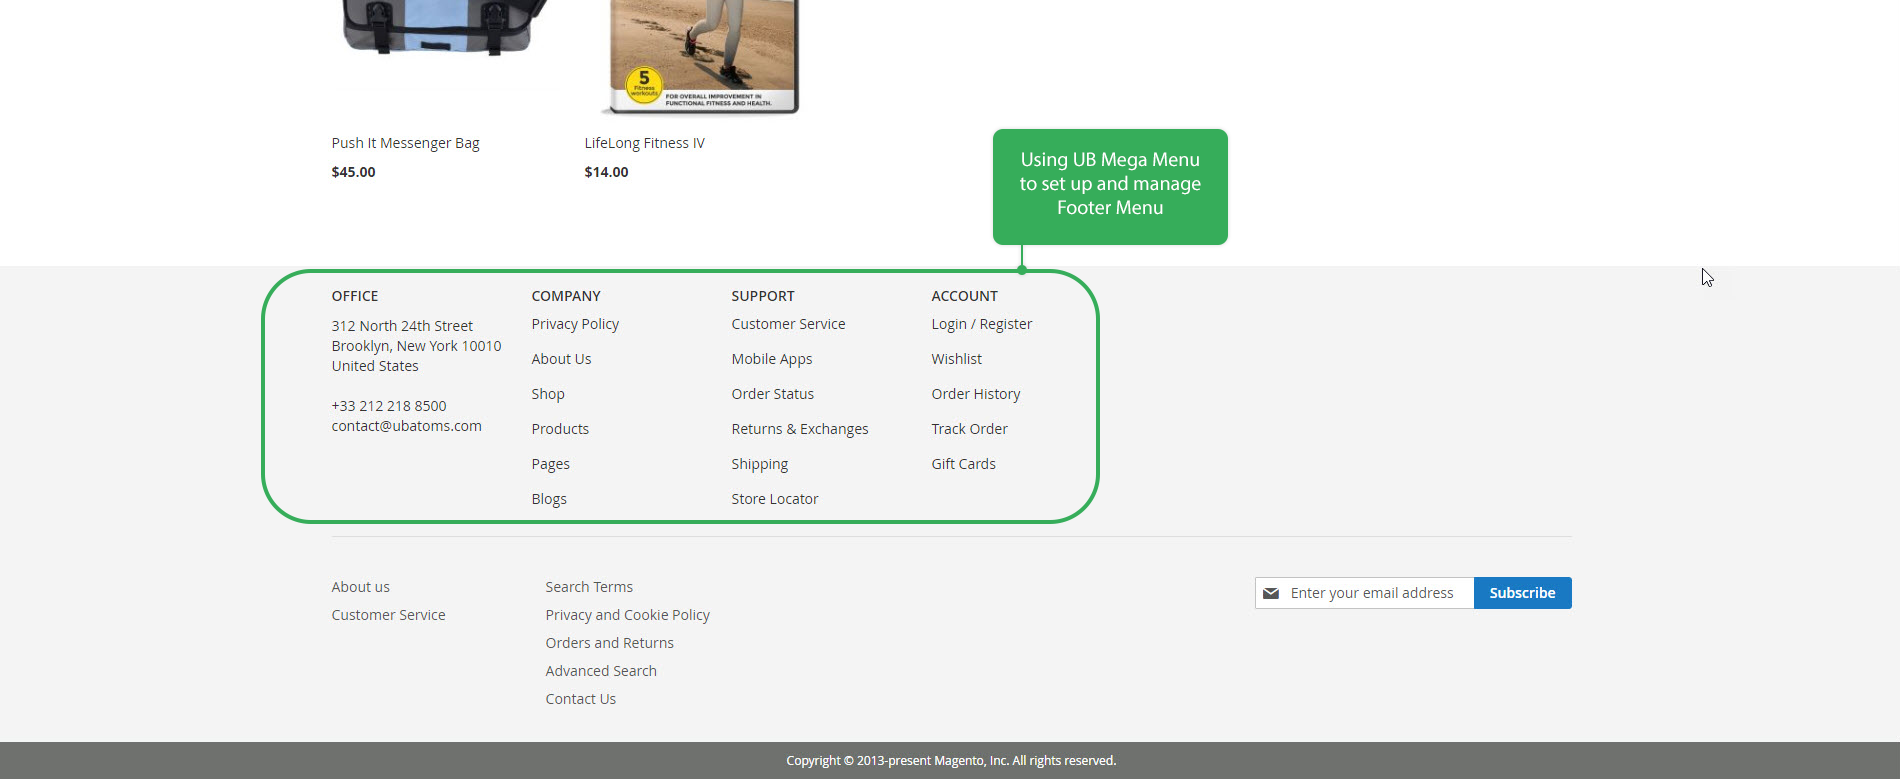 UB Mega Menu - Footer menu type